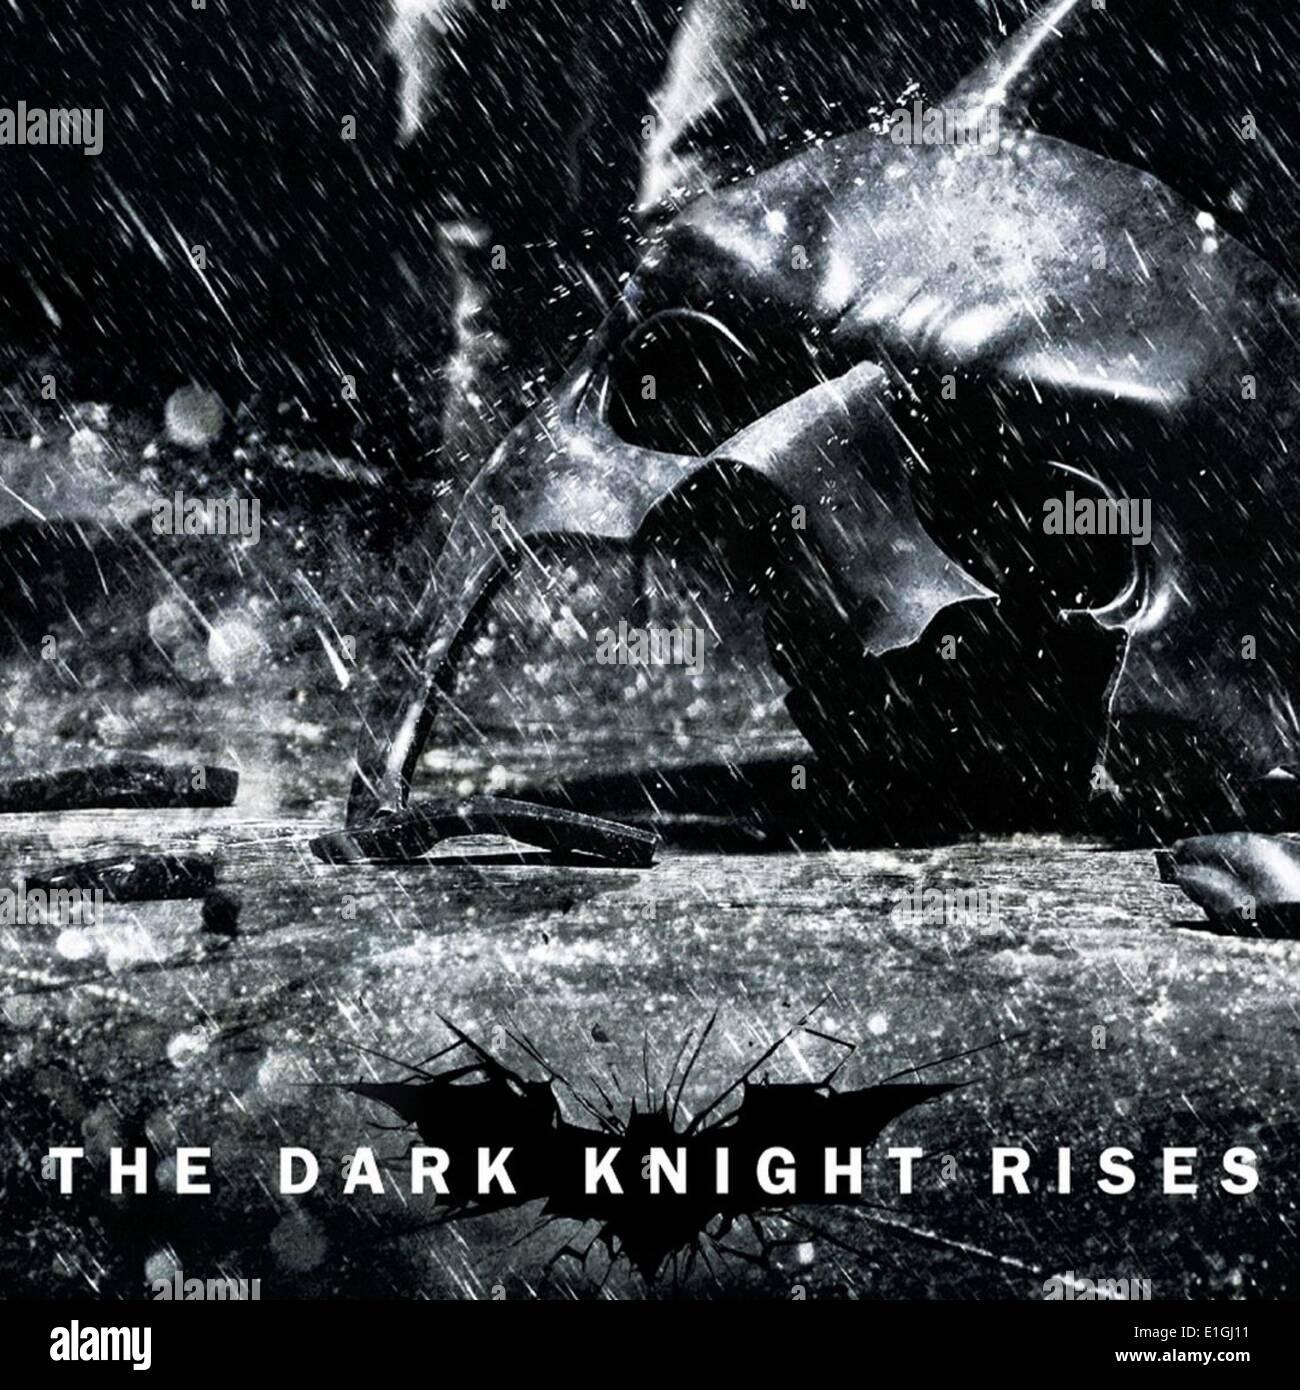 THE DARK KNIGHT Movie PHOTO Print POSTER Film 2008 The Joker Heath Ledger 017